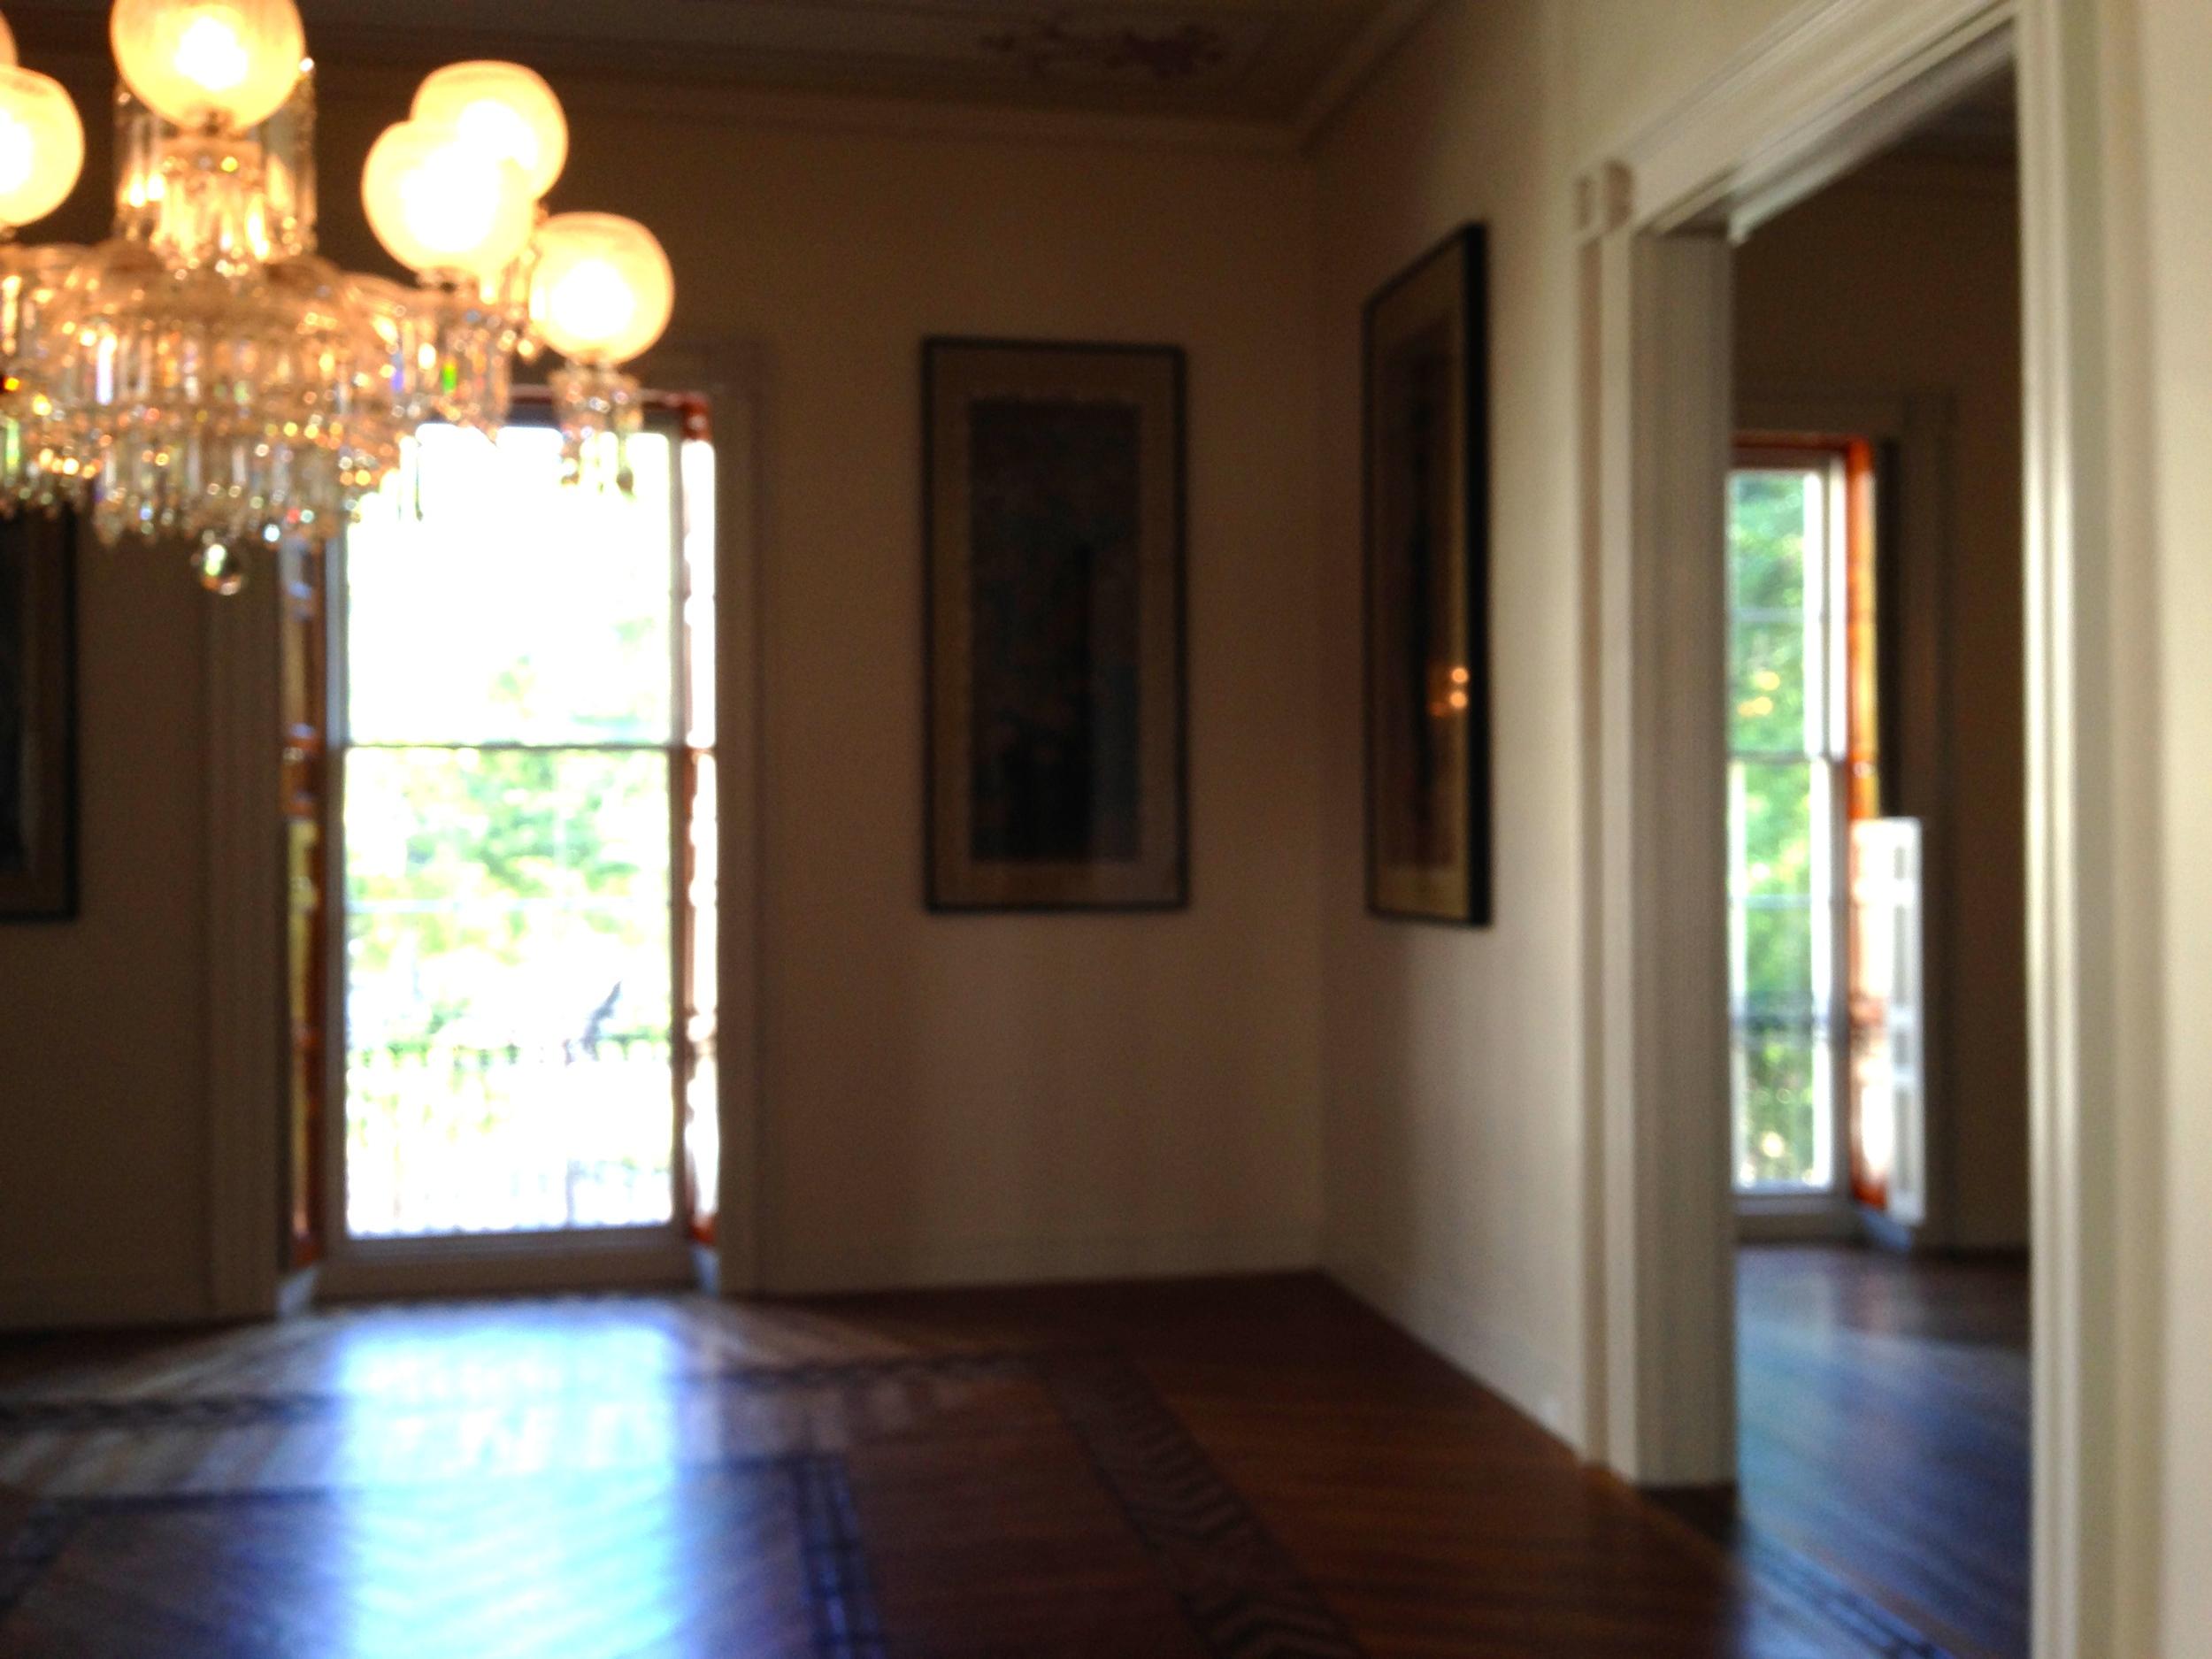 California Room with original chandelier.